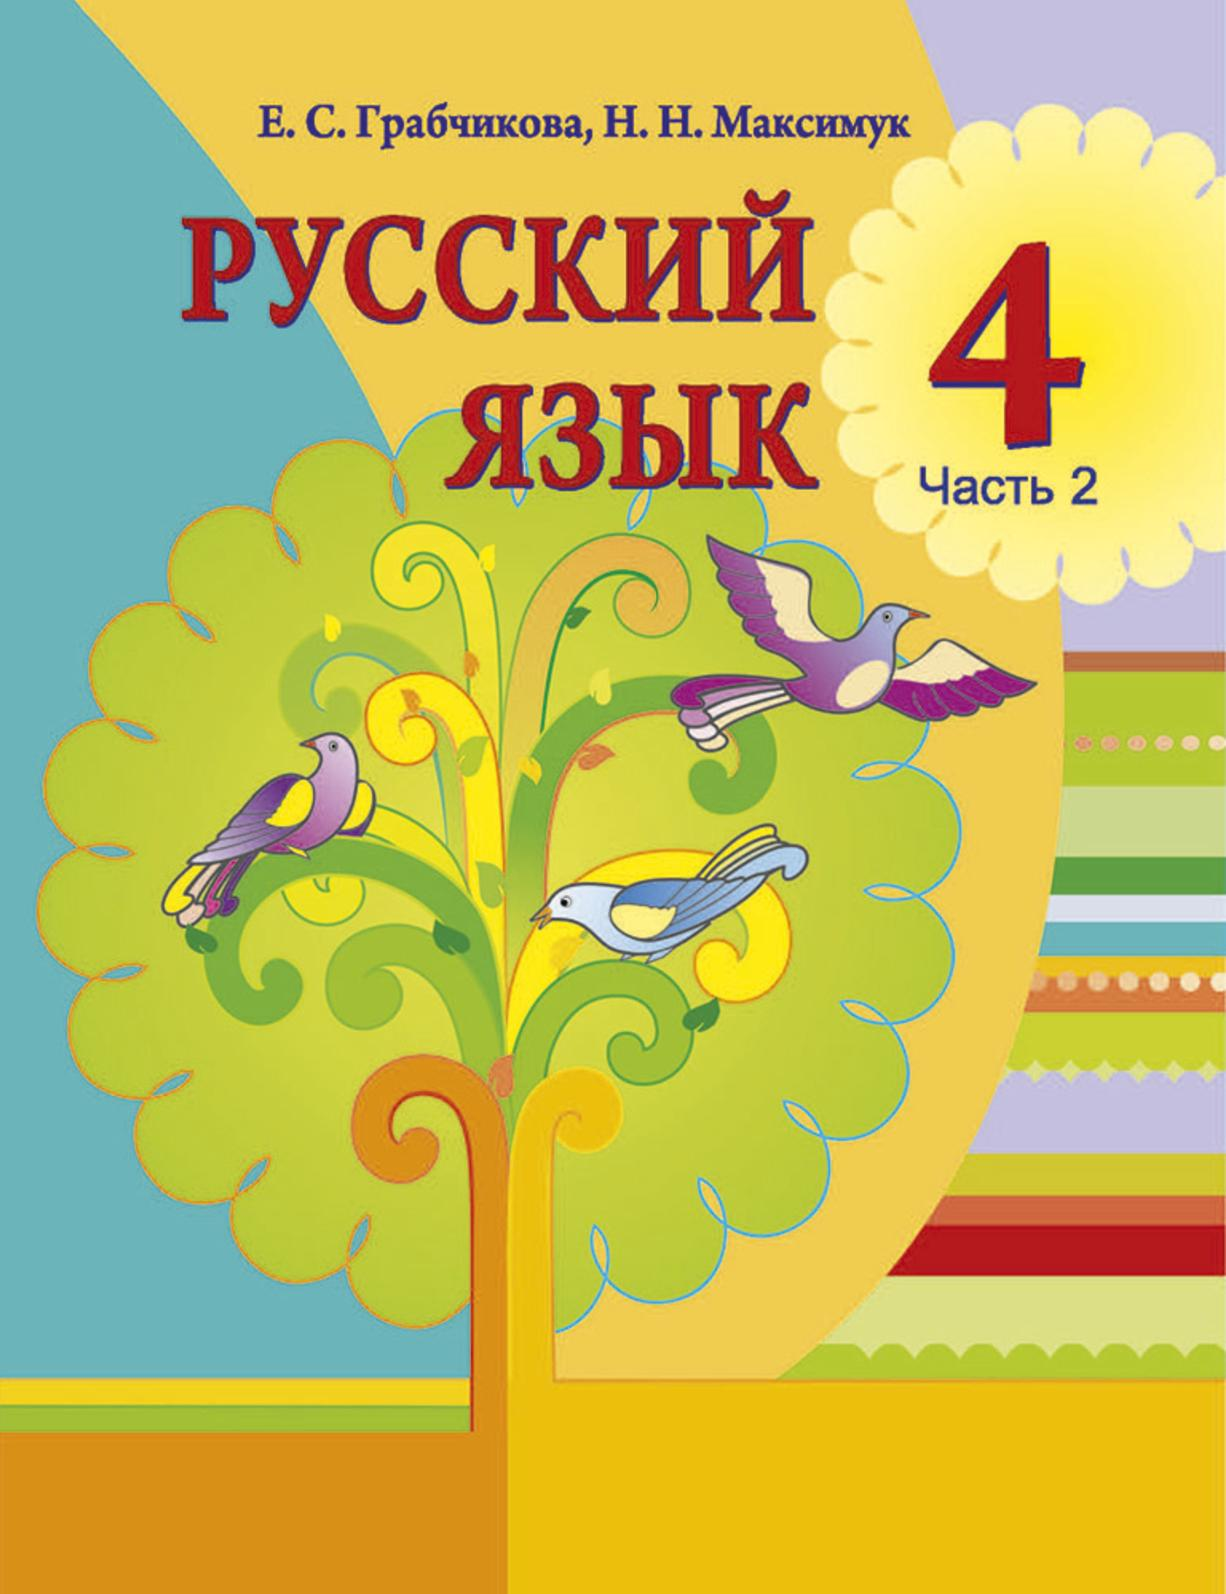 язык класс антипова гдз 2 русский